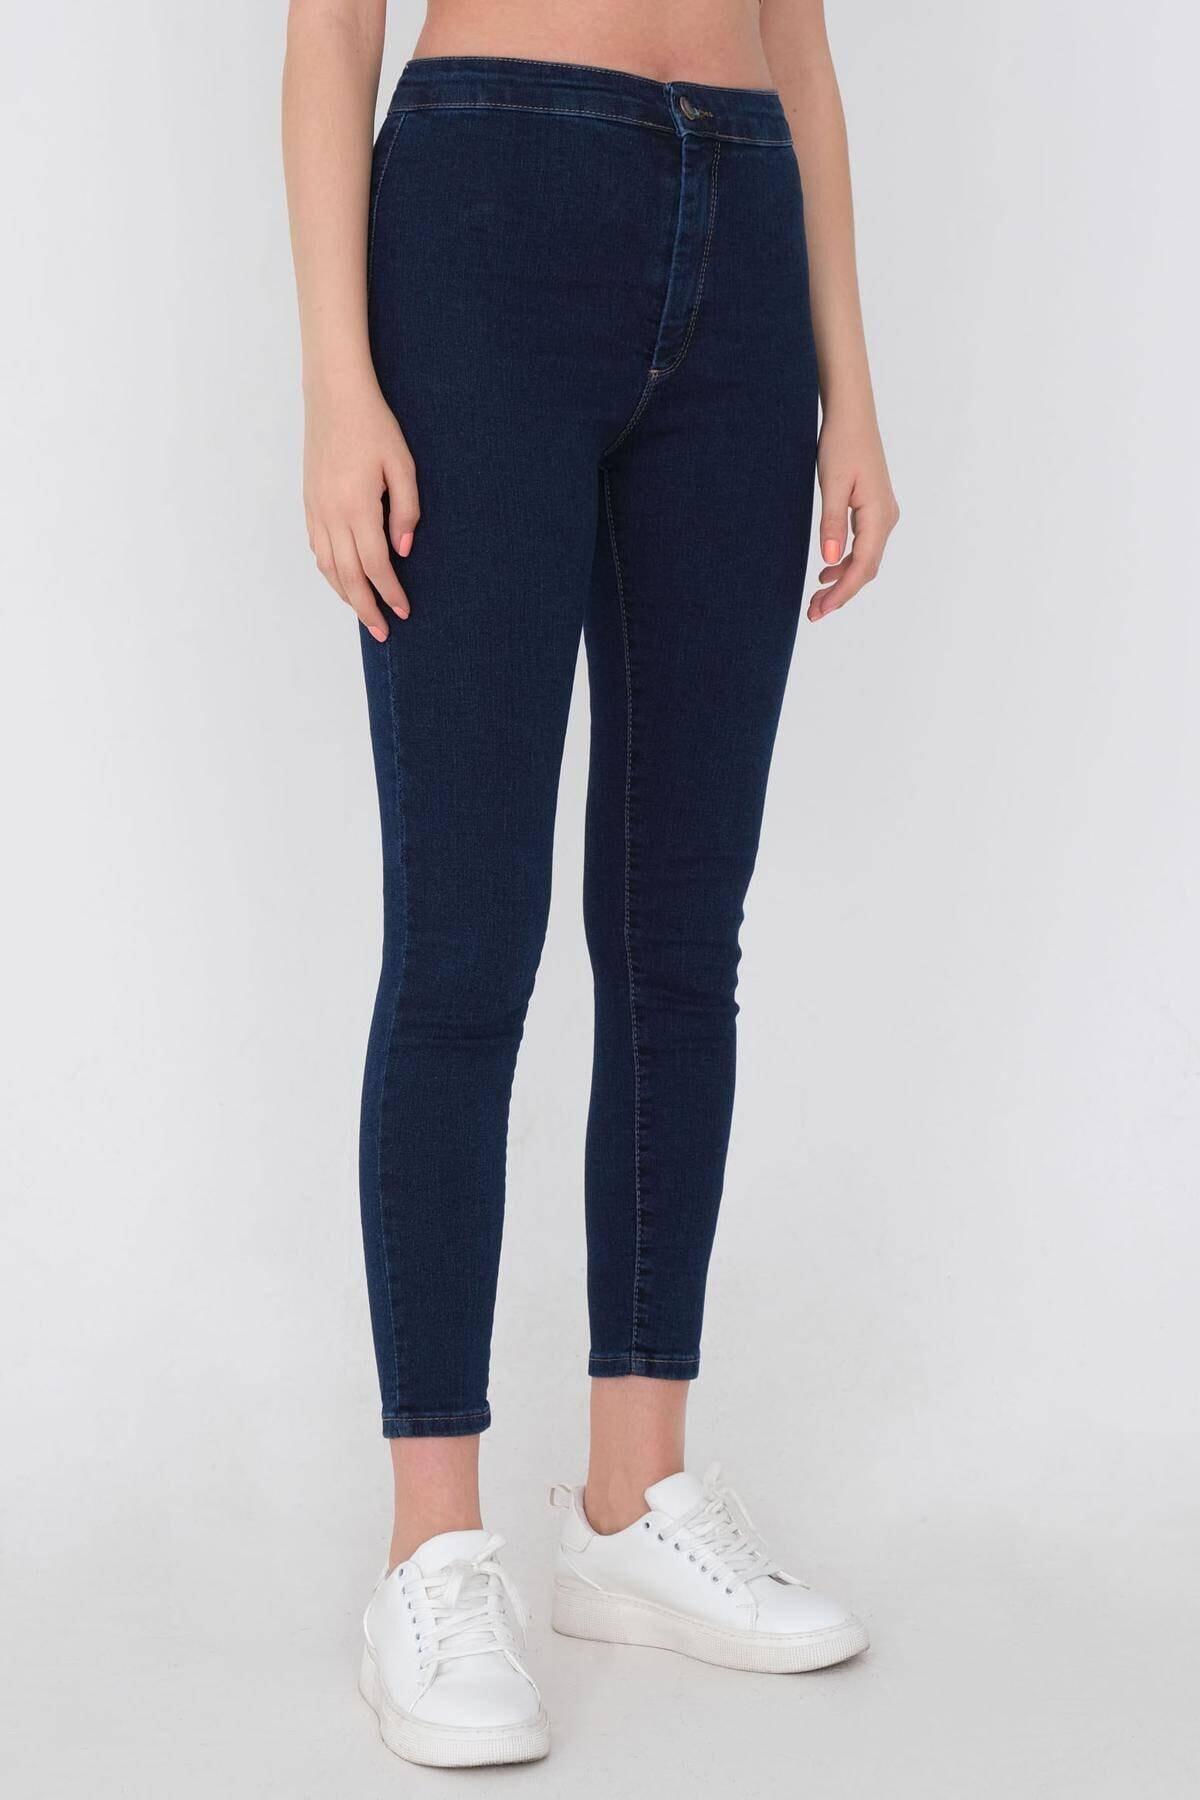 Addax Kadın Koyu Kot Rengi Yüksek Bel Pantolon Pn11178 - Pnu ADX-0000016107 2